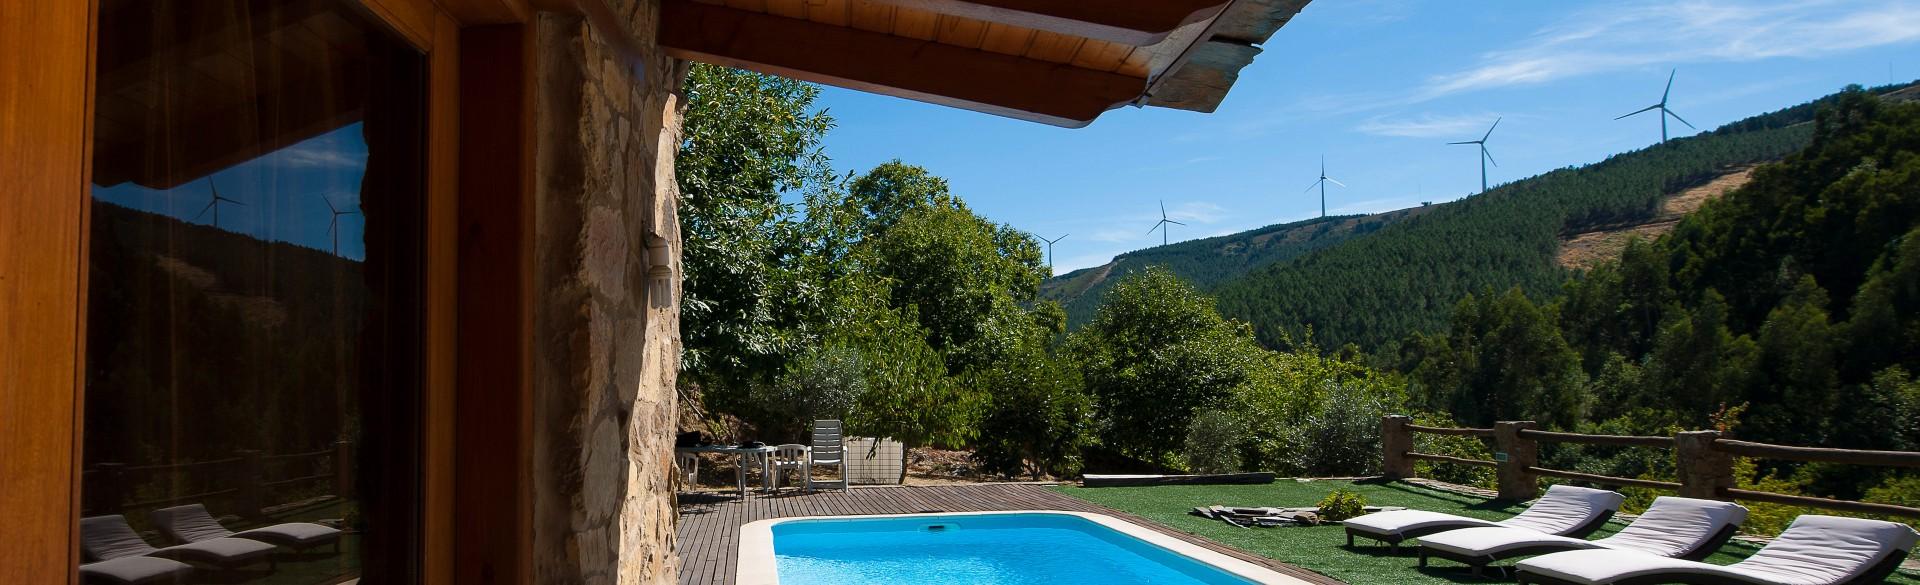 Casa da Madeira - Mountain Whisper